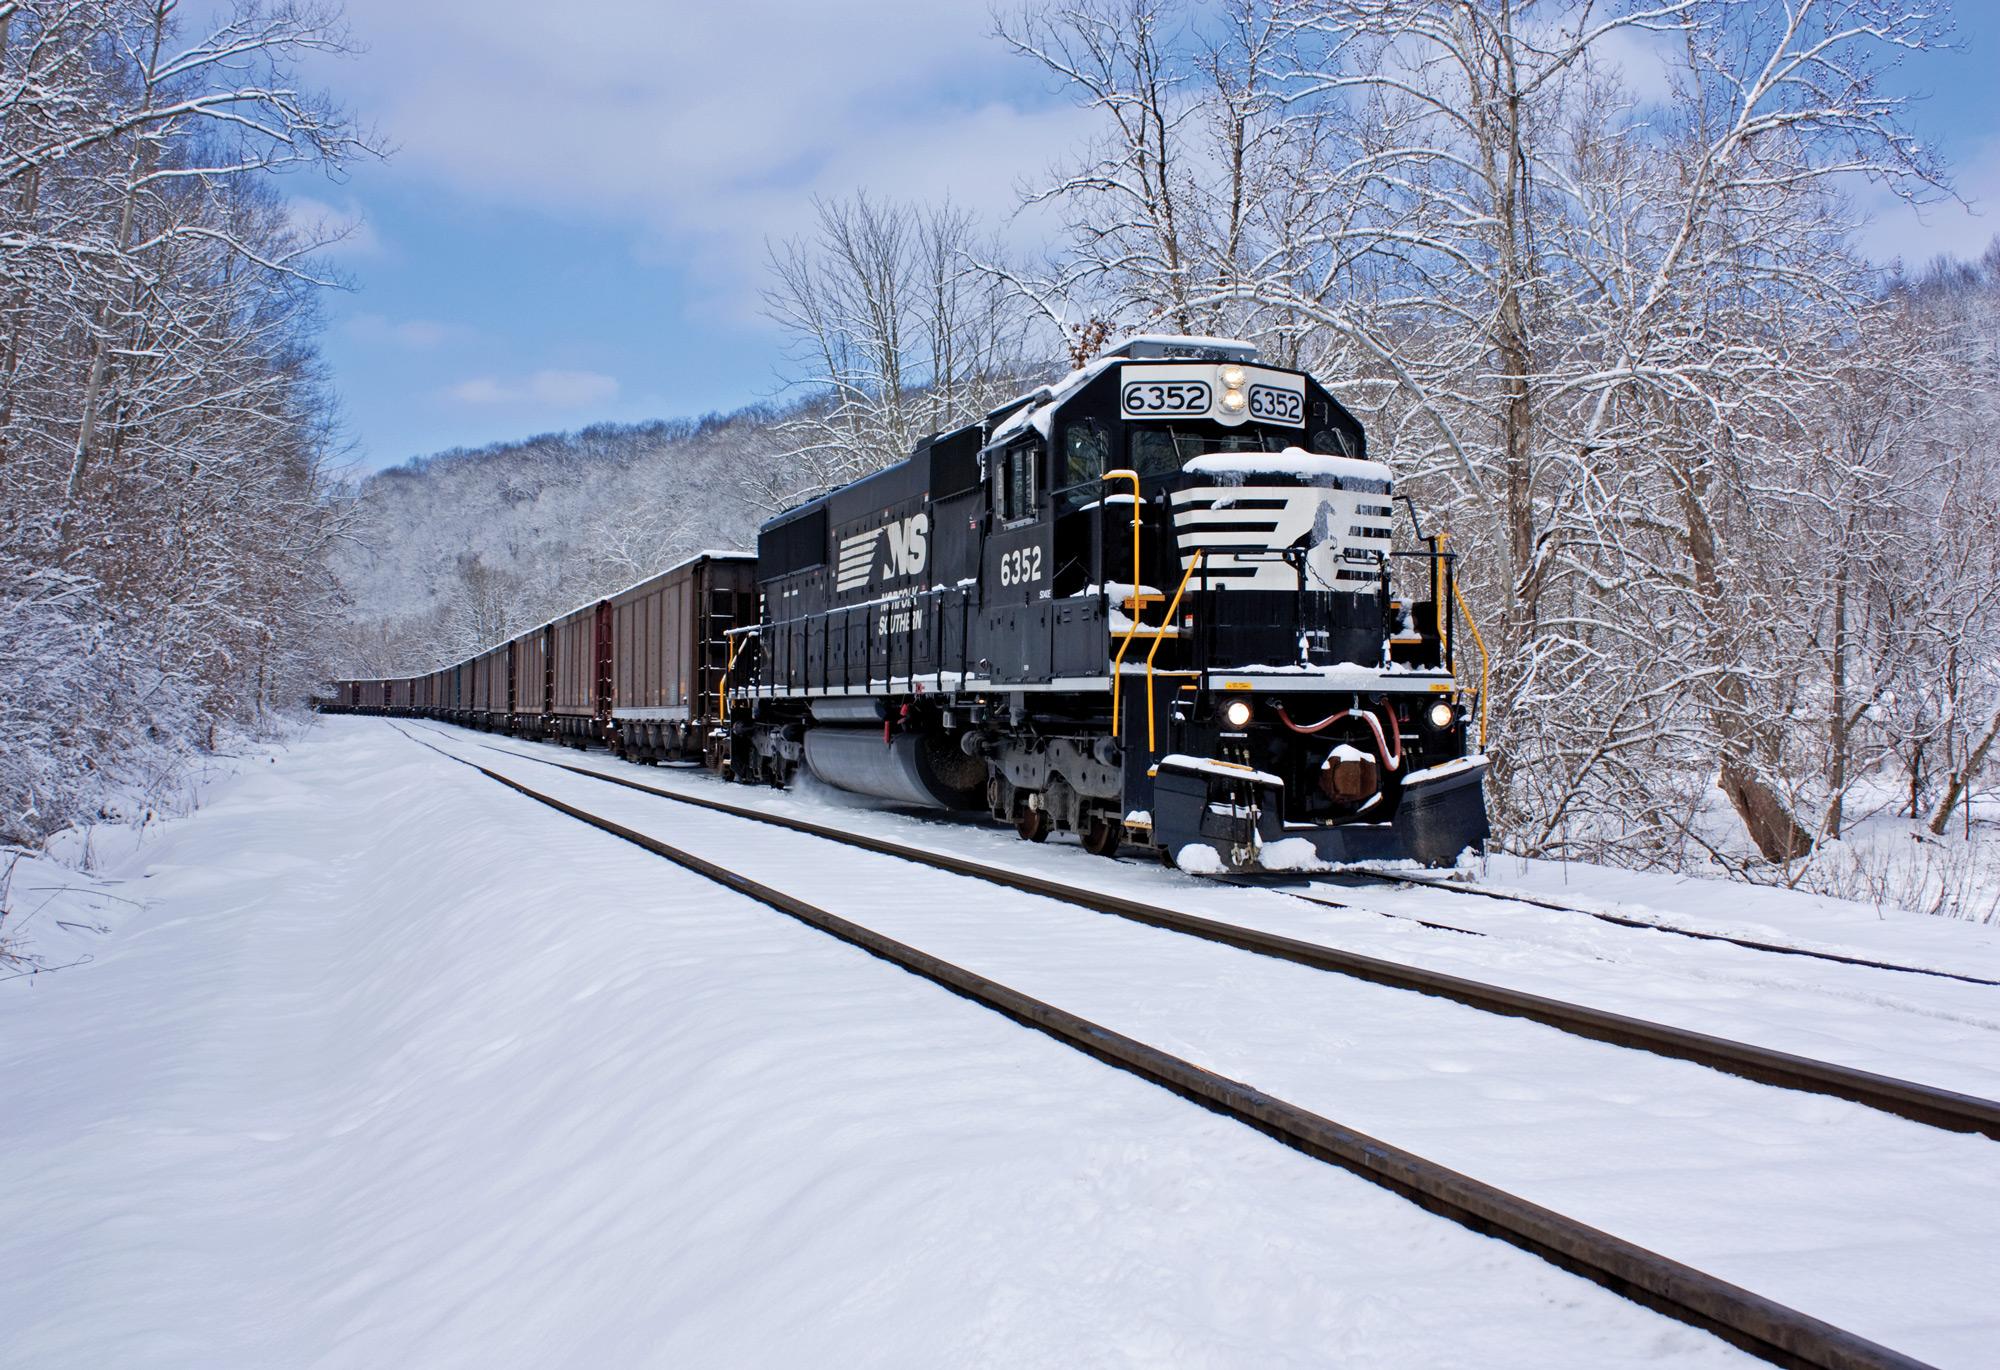 A Norfolk Southern locomotive engine pulls a train through snow.